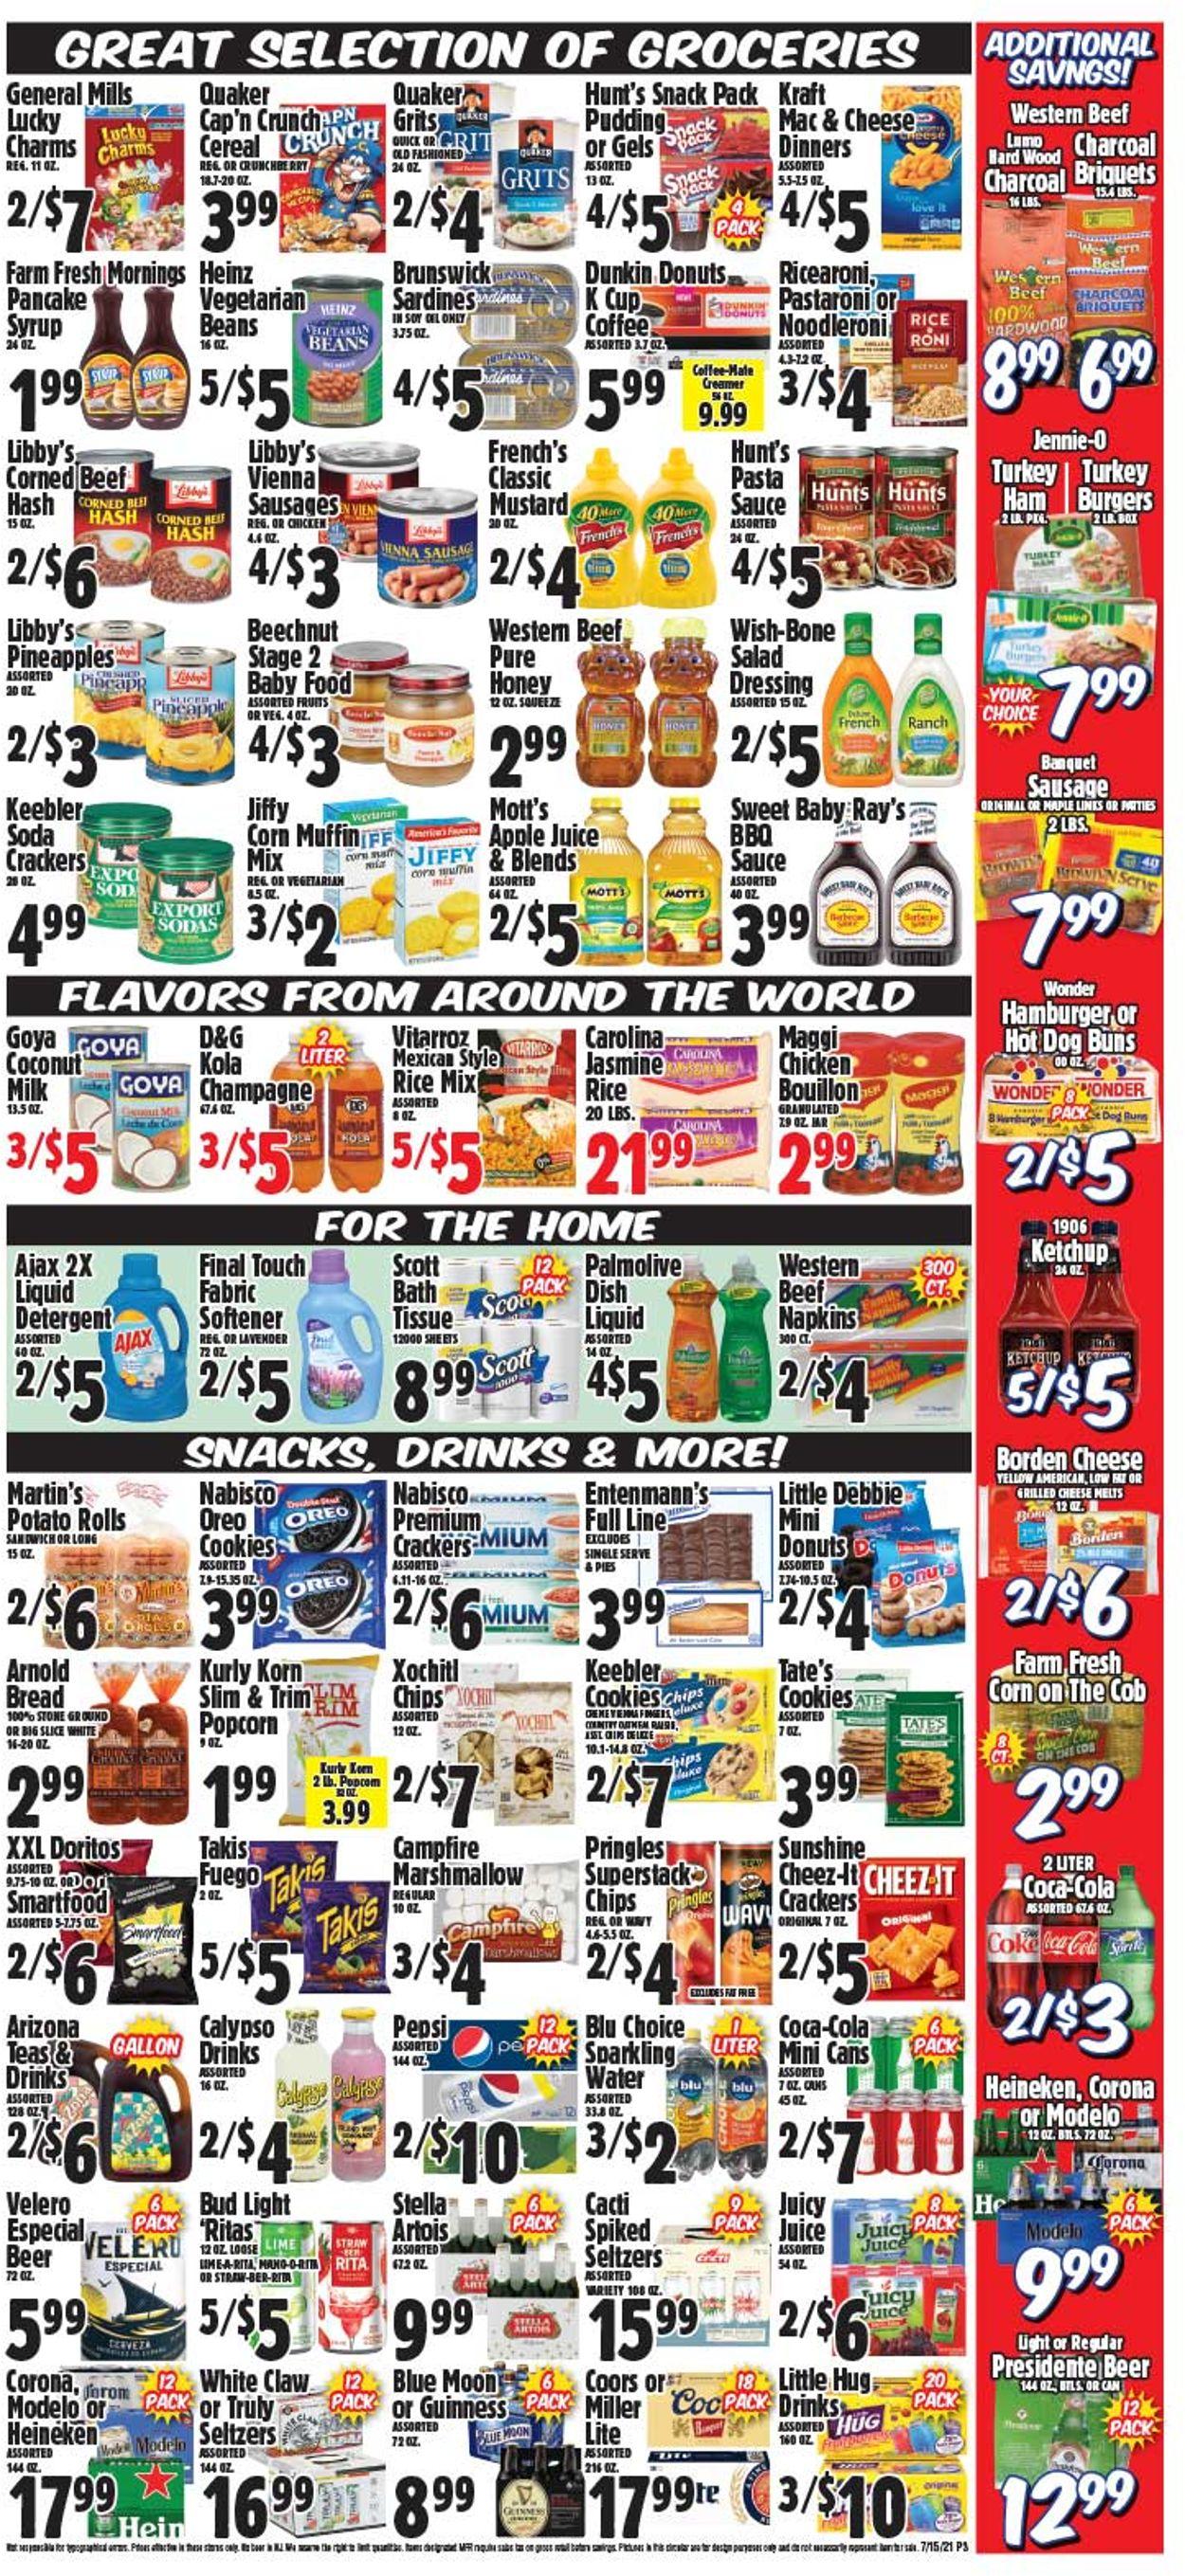 Western Beef Weekly Ad Circular - valid 07/15-07/21/2021 (Page 4)